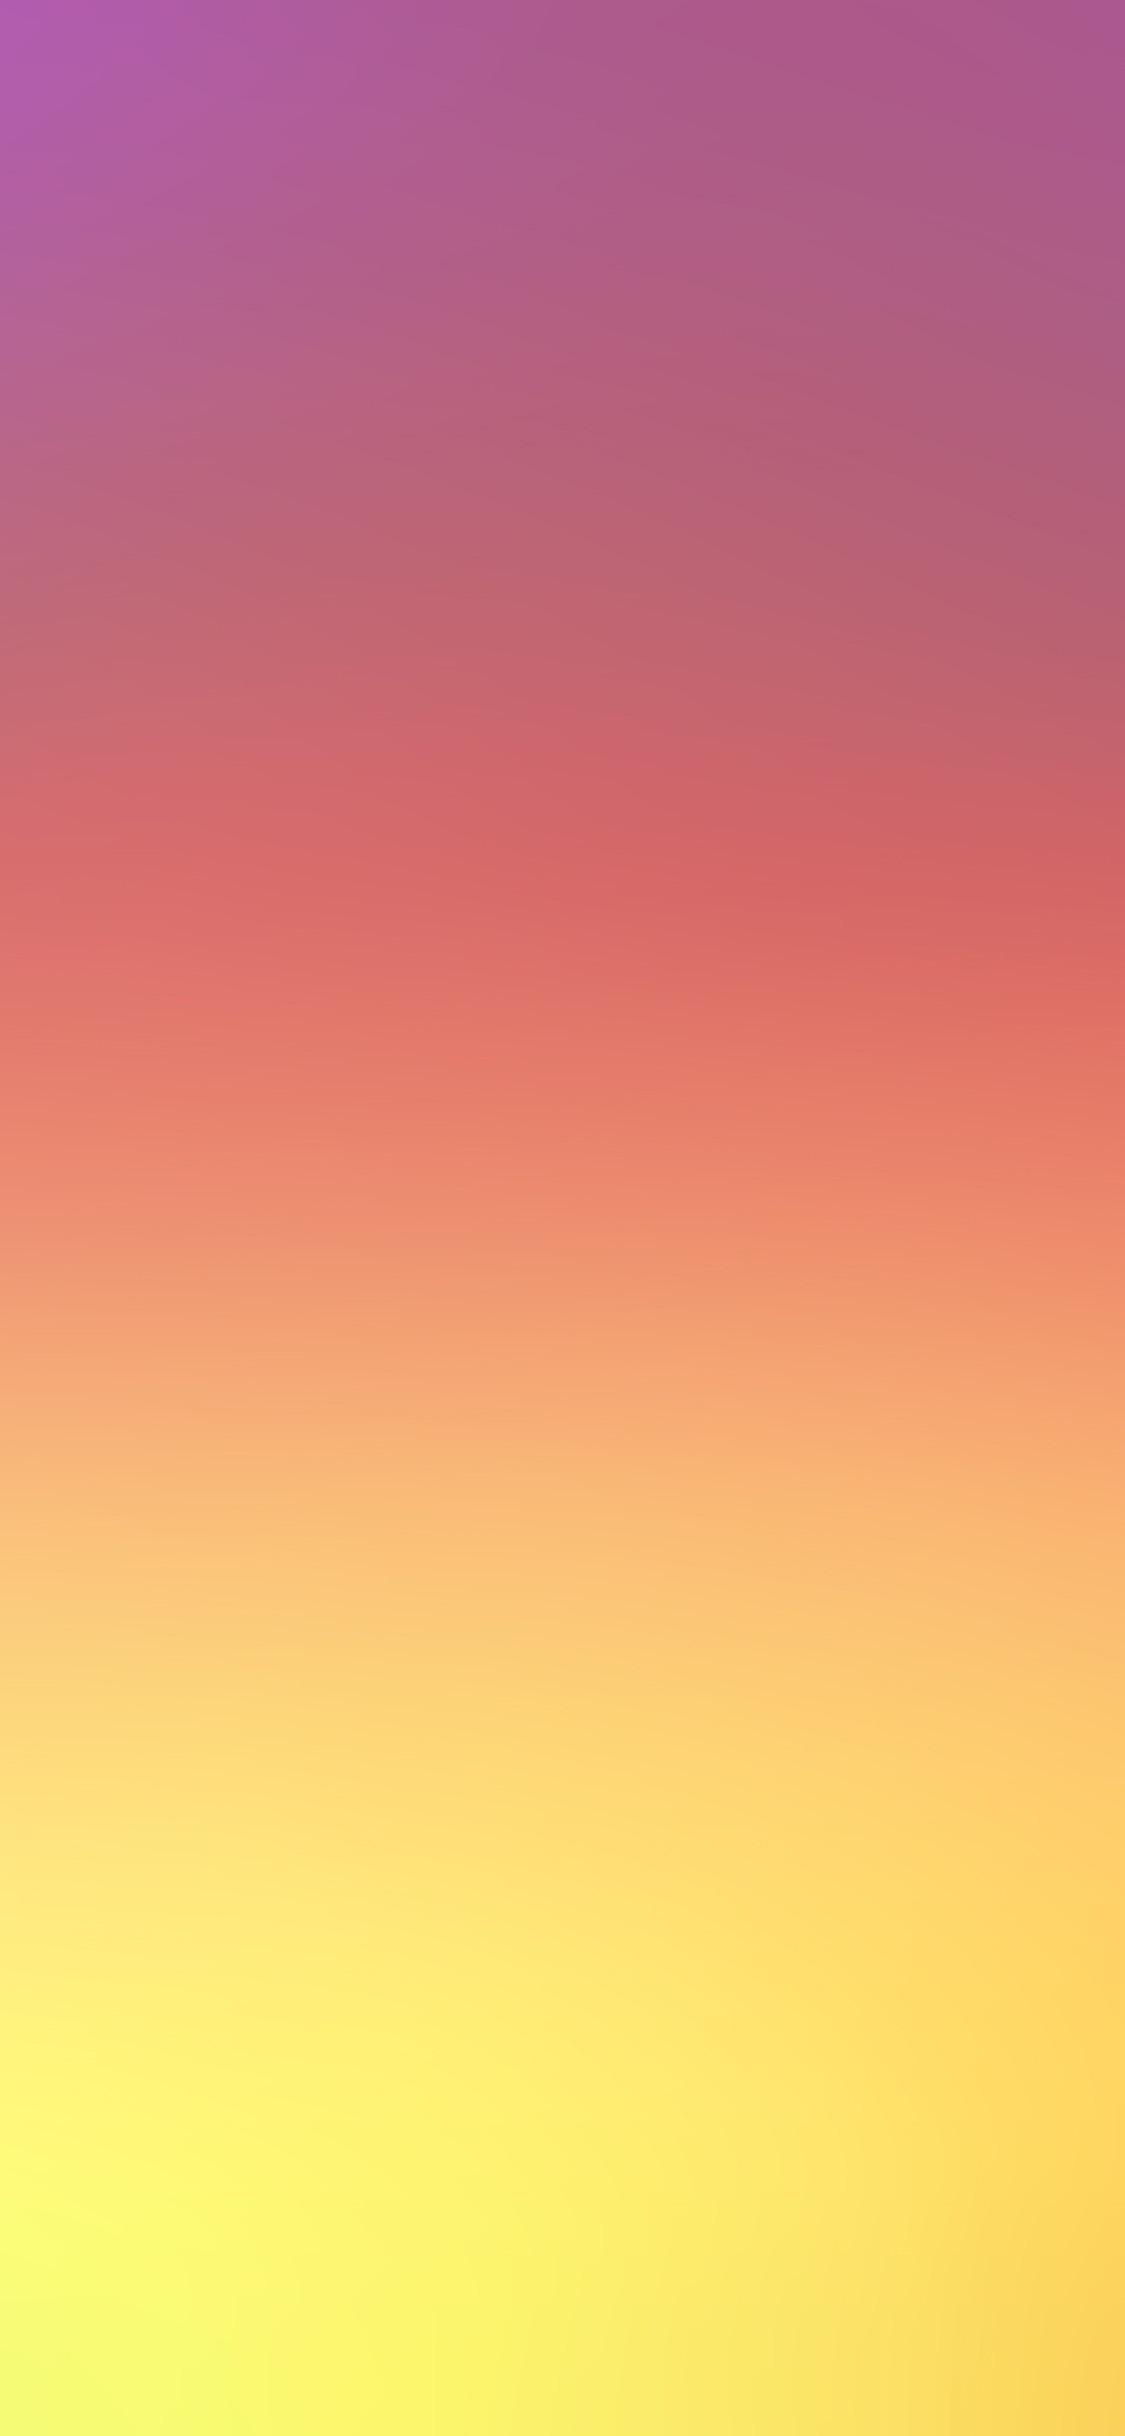 836541 free download soft pink wallpaper